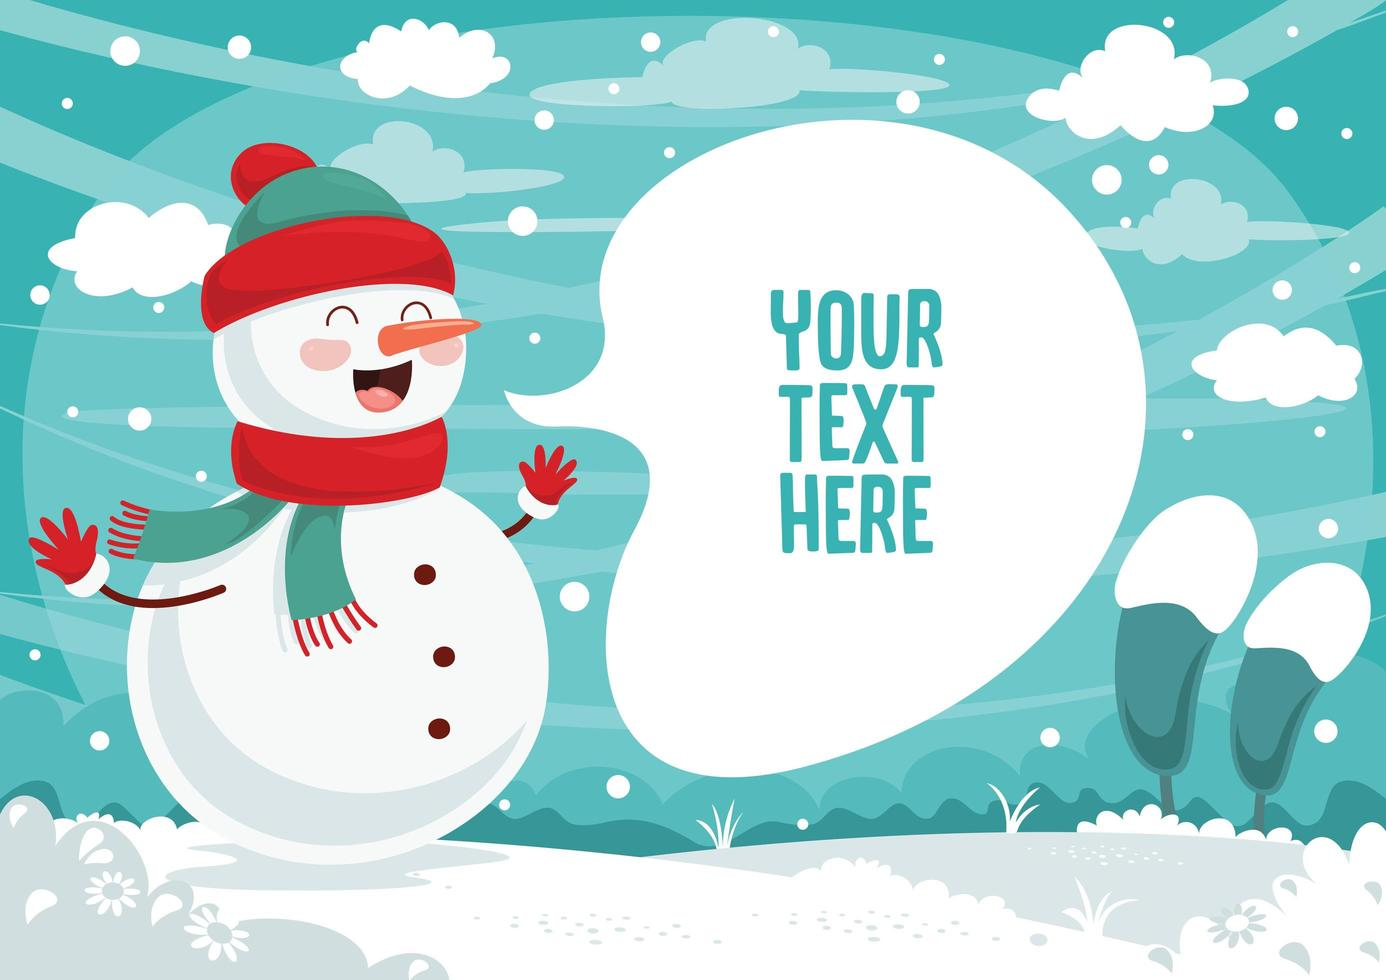 Snowman and Speech Bubble in Winter Landscape vector